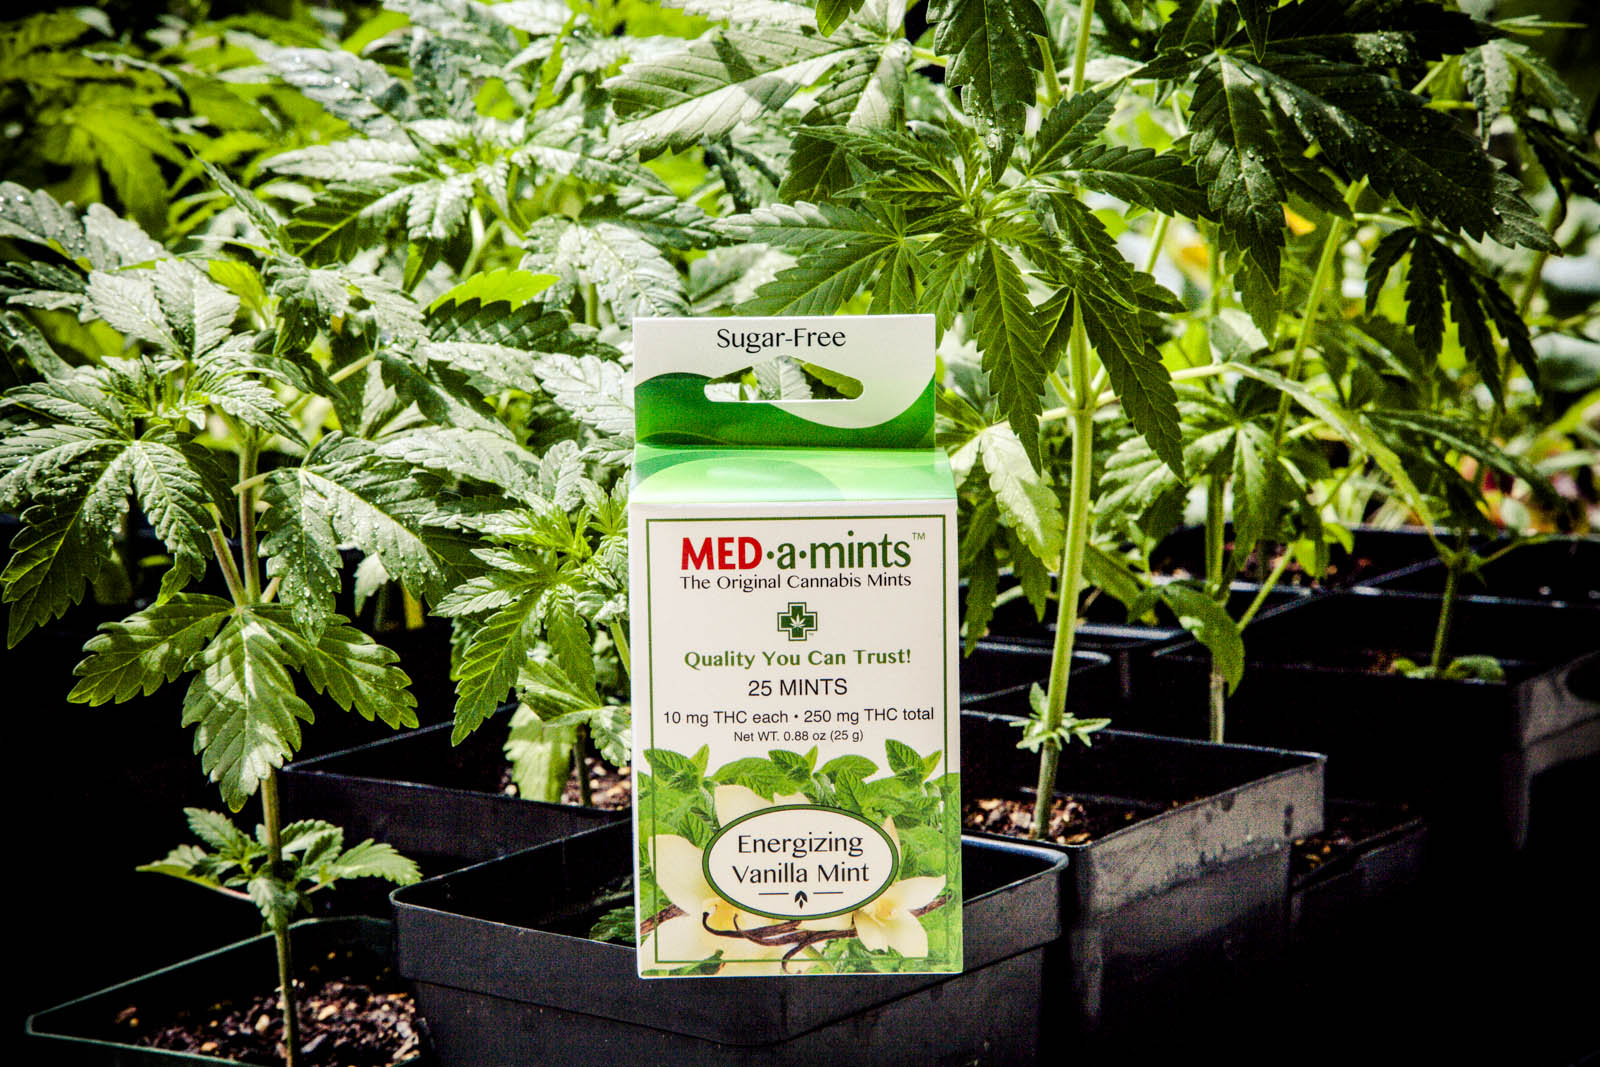 medamints-potent-thc-cannabis-marijuana-mints-023